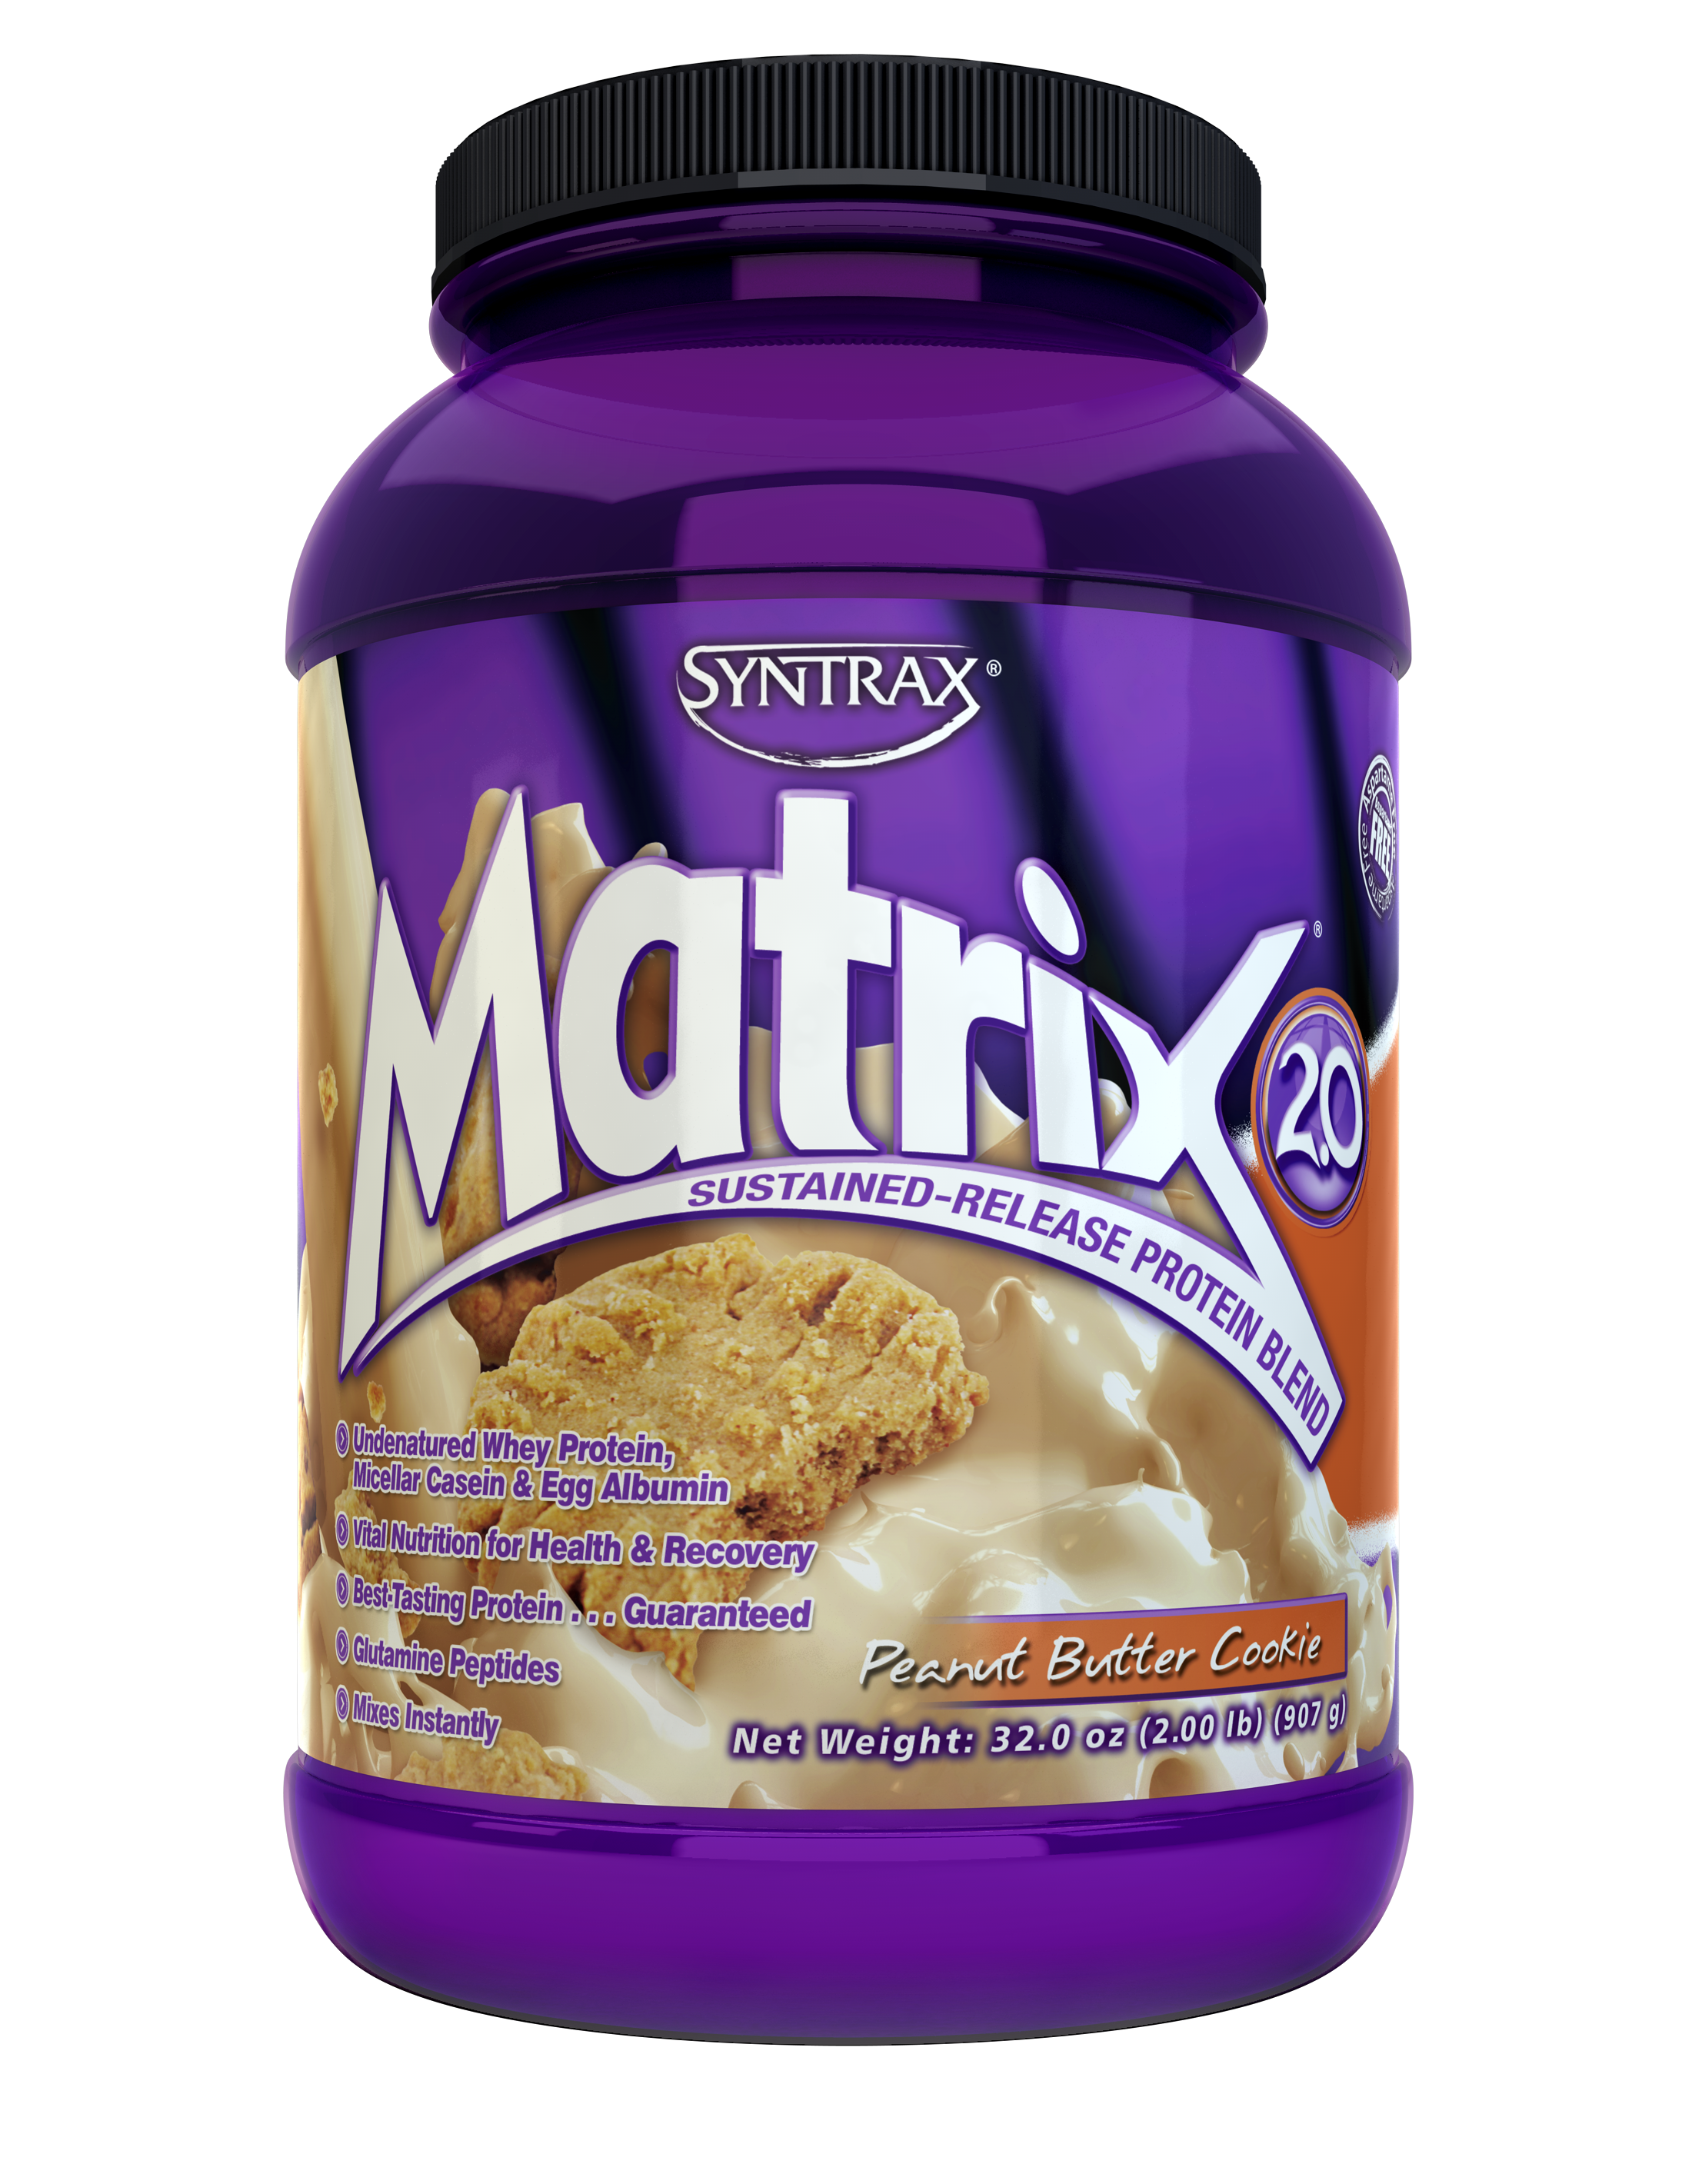 Syntrax Matrix 2.0 - Peanut Butter Cookie 2 lb